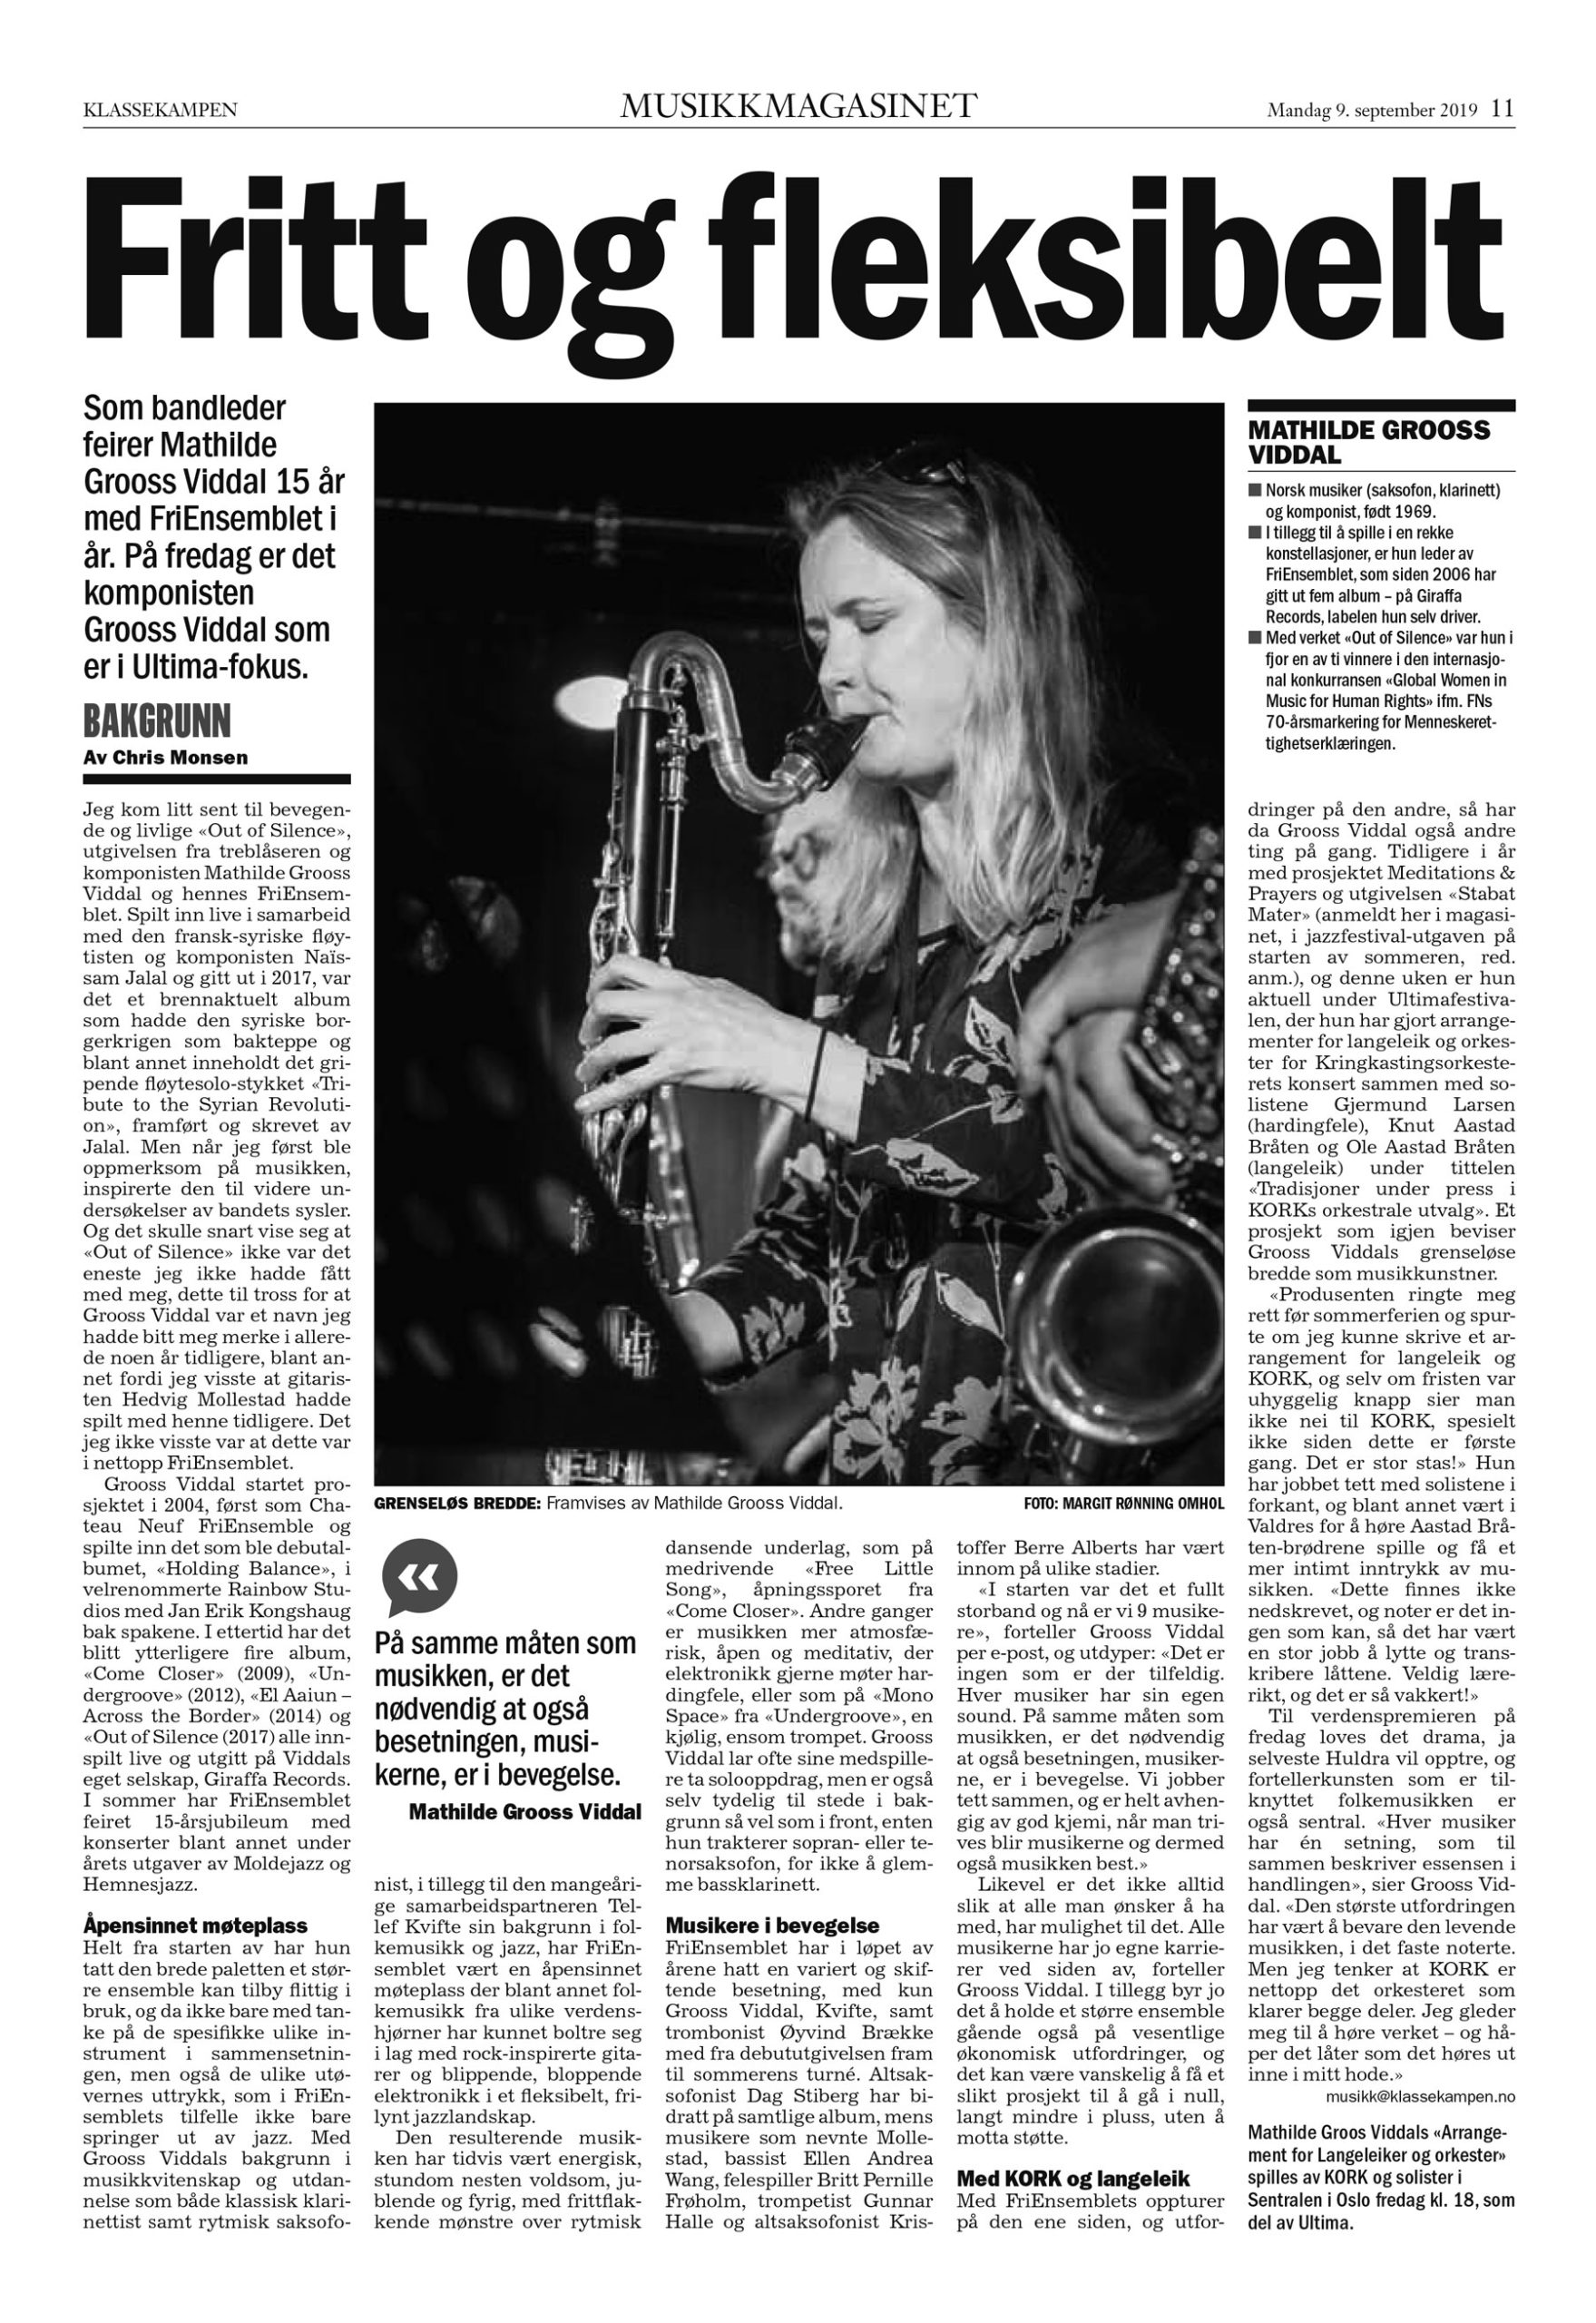 MusikMagazinet Sep 2019 – Mathilde Grooss Viddal